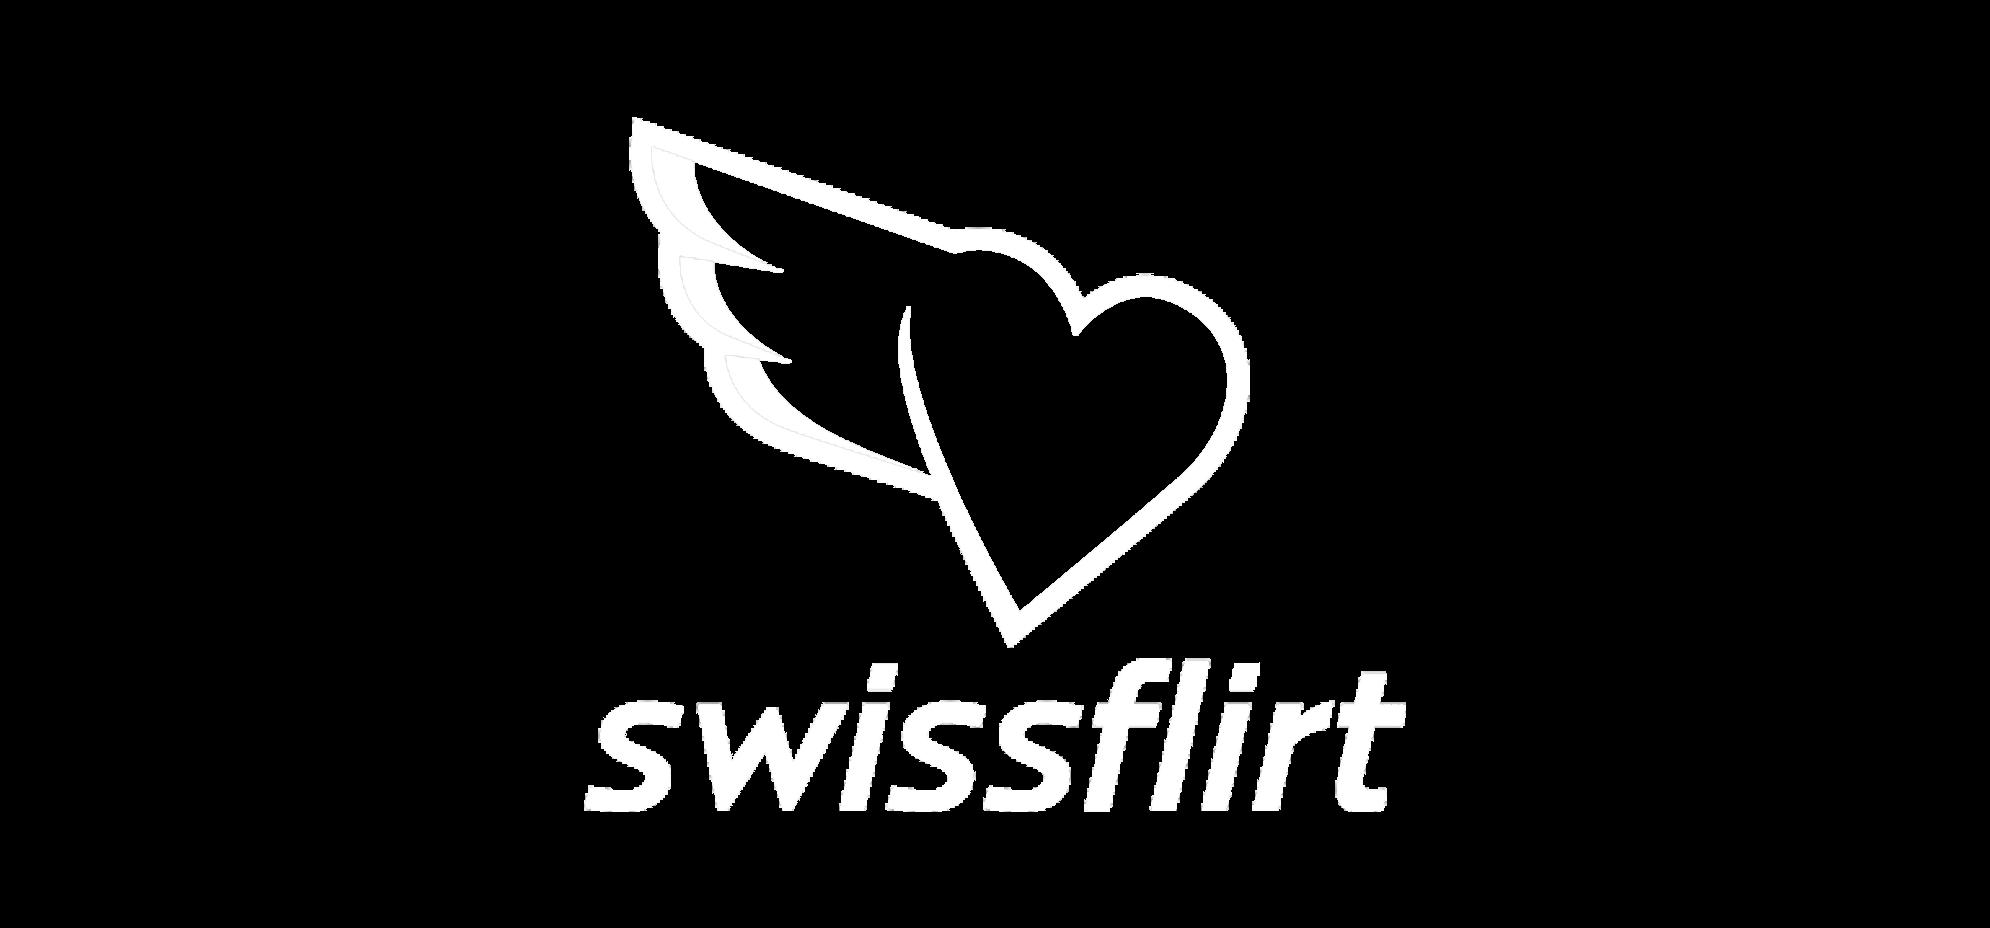 Filmproduktion Bern - BOFF. - Logo swissflirt